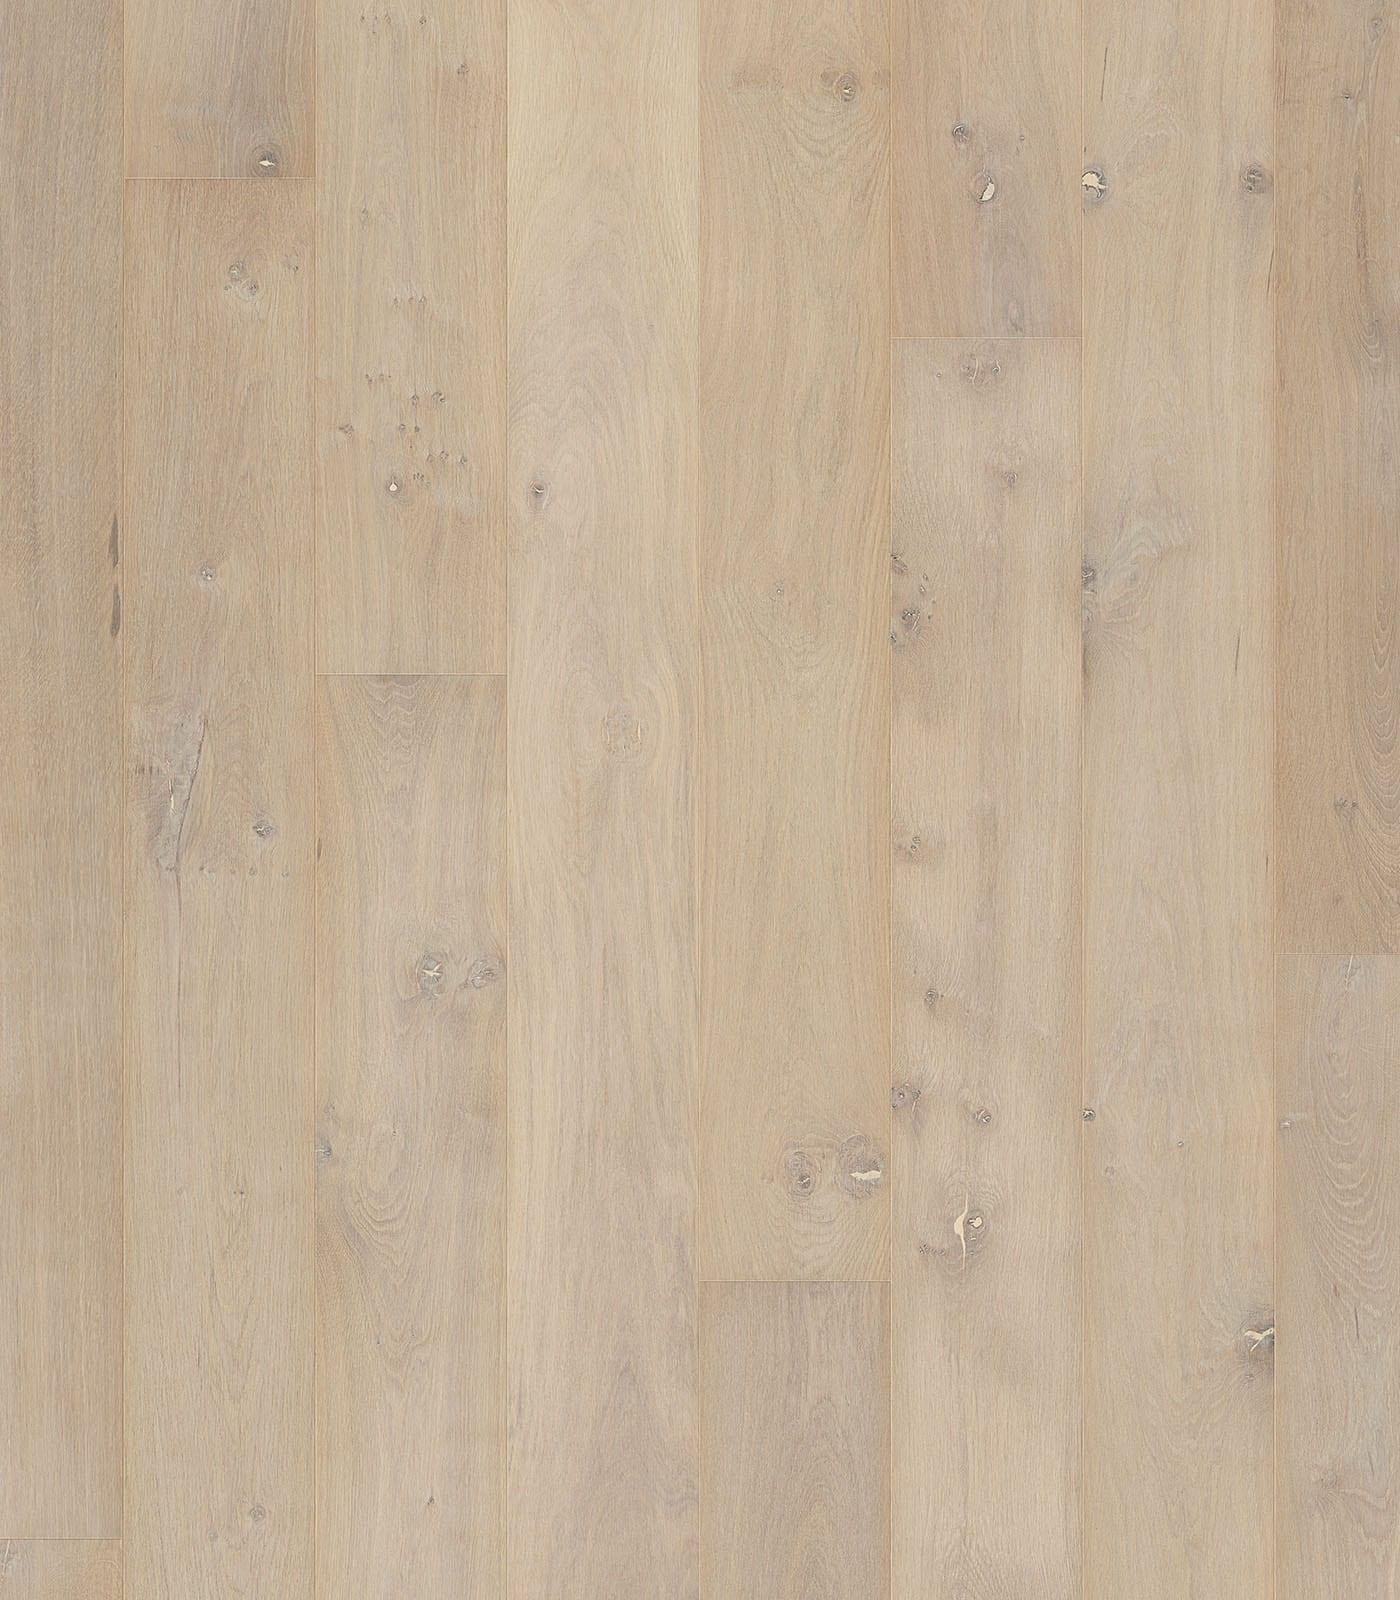 Aspen-Lifestyle Collection-European Oak Floors-flat